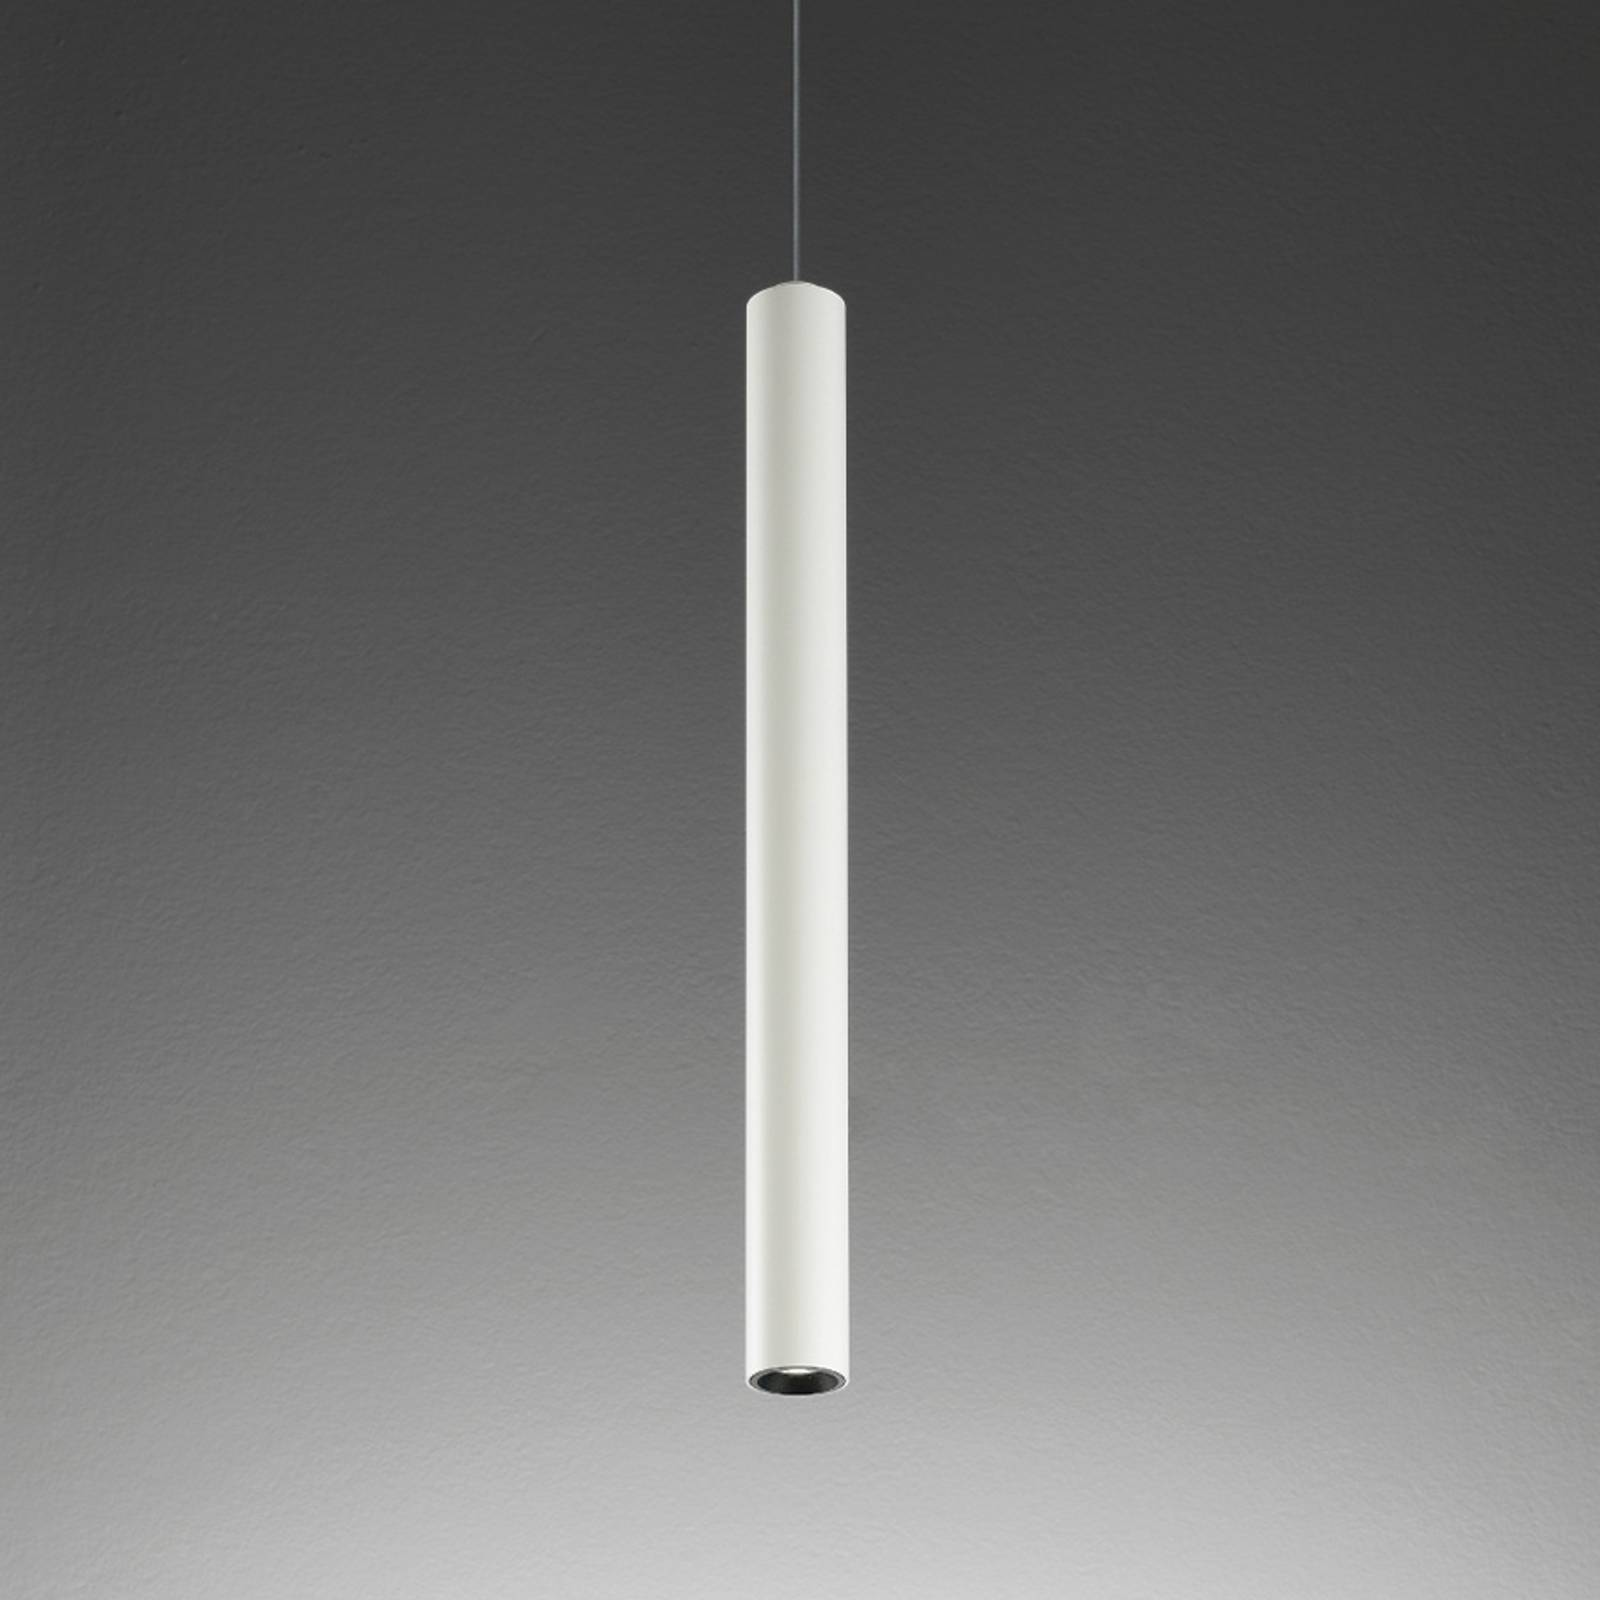 Suspension LED efficace Lilli